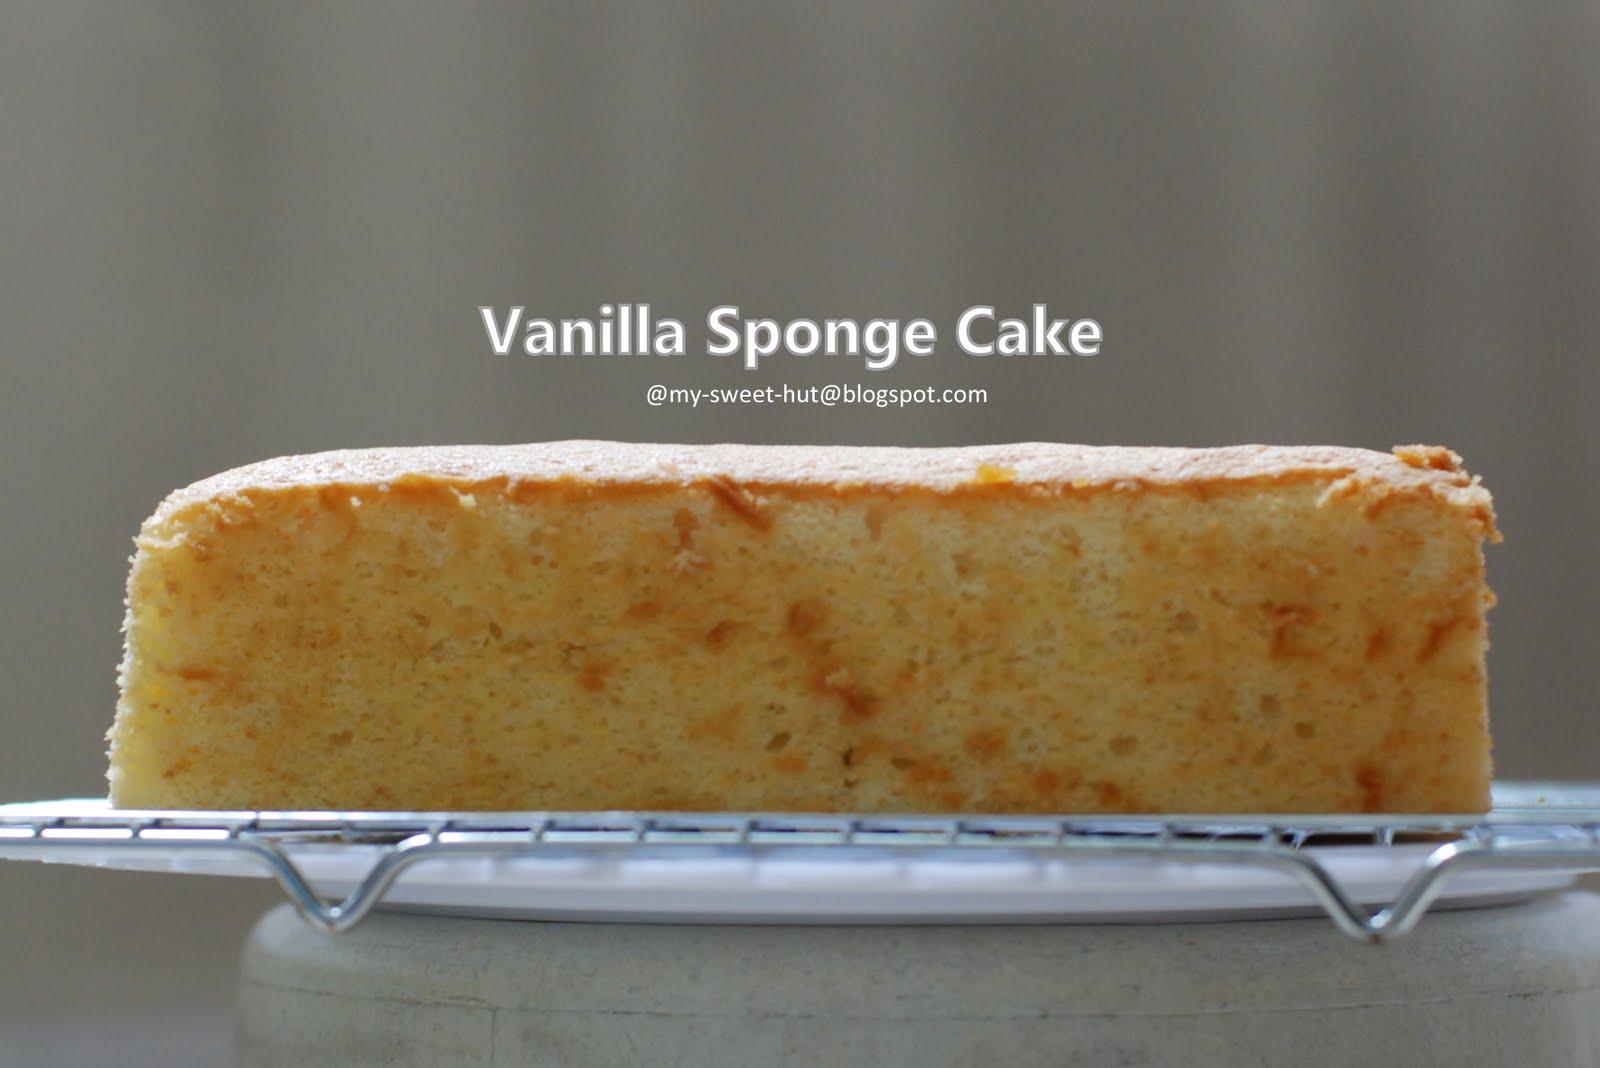 My sweet hut vanilla sponge cake basic for Basic vanilla sponge